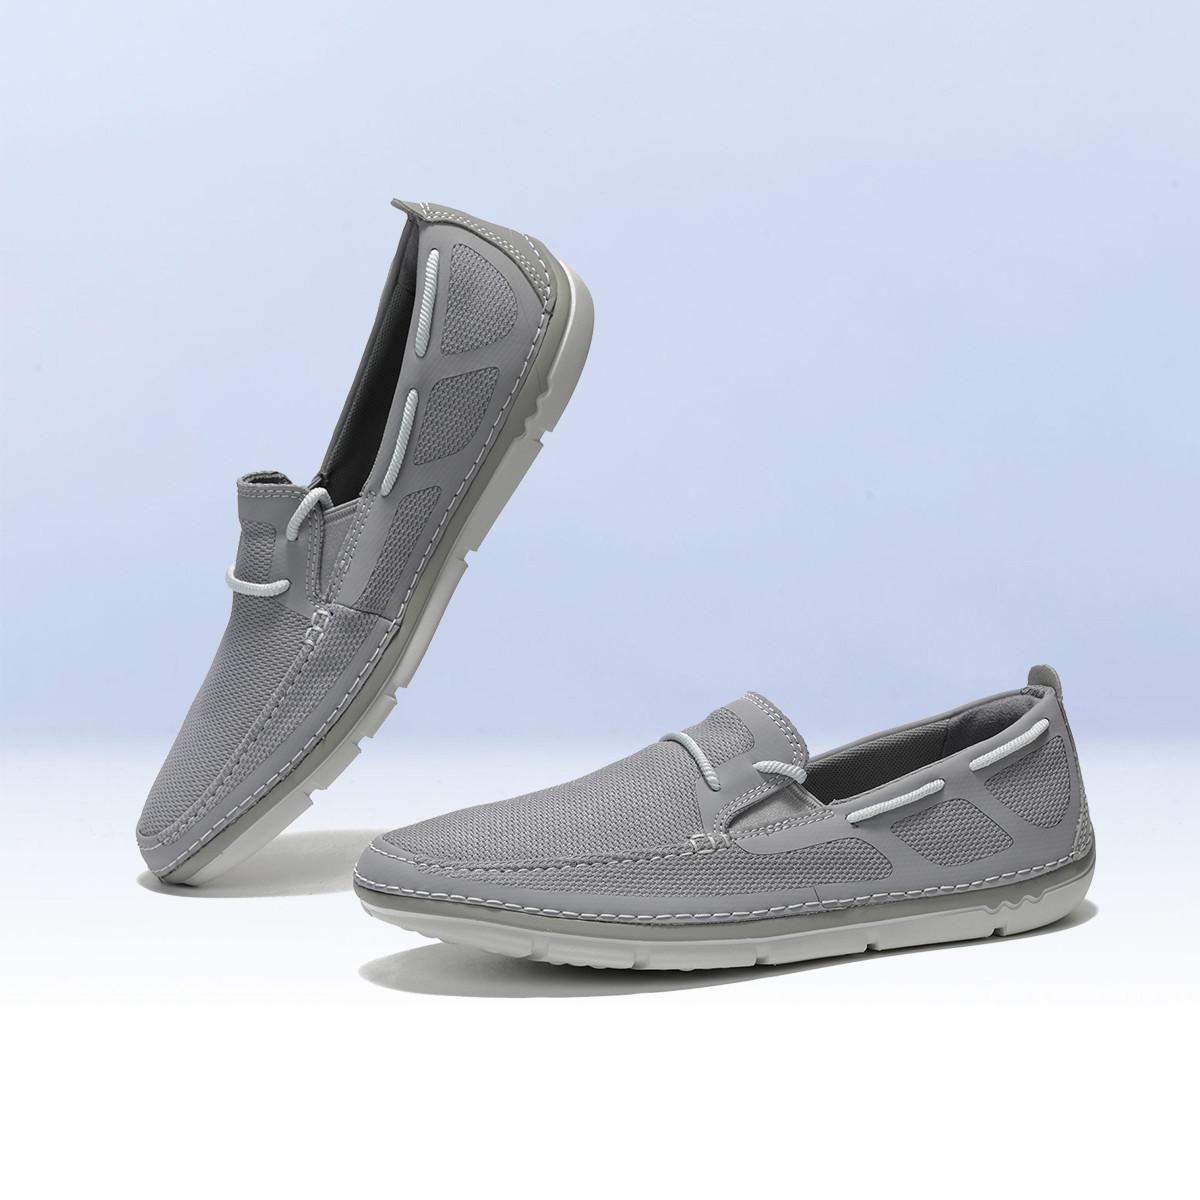 Clarks 其乐 261333067 男士一脚蹬单鞋